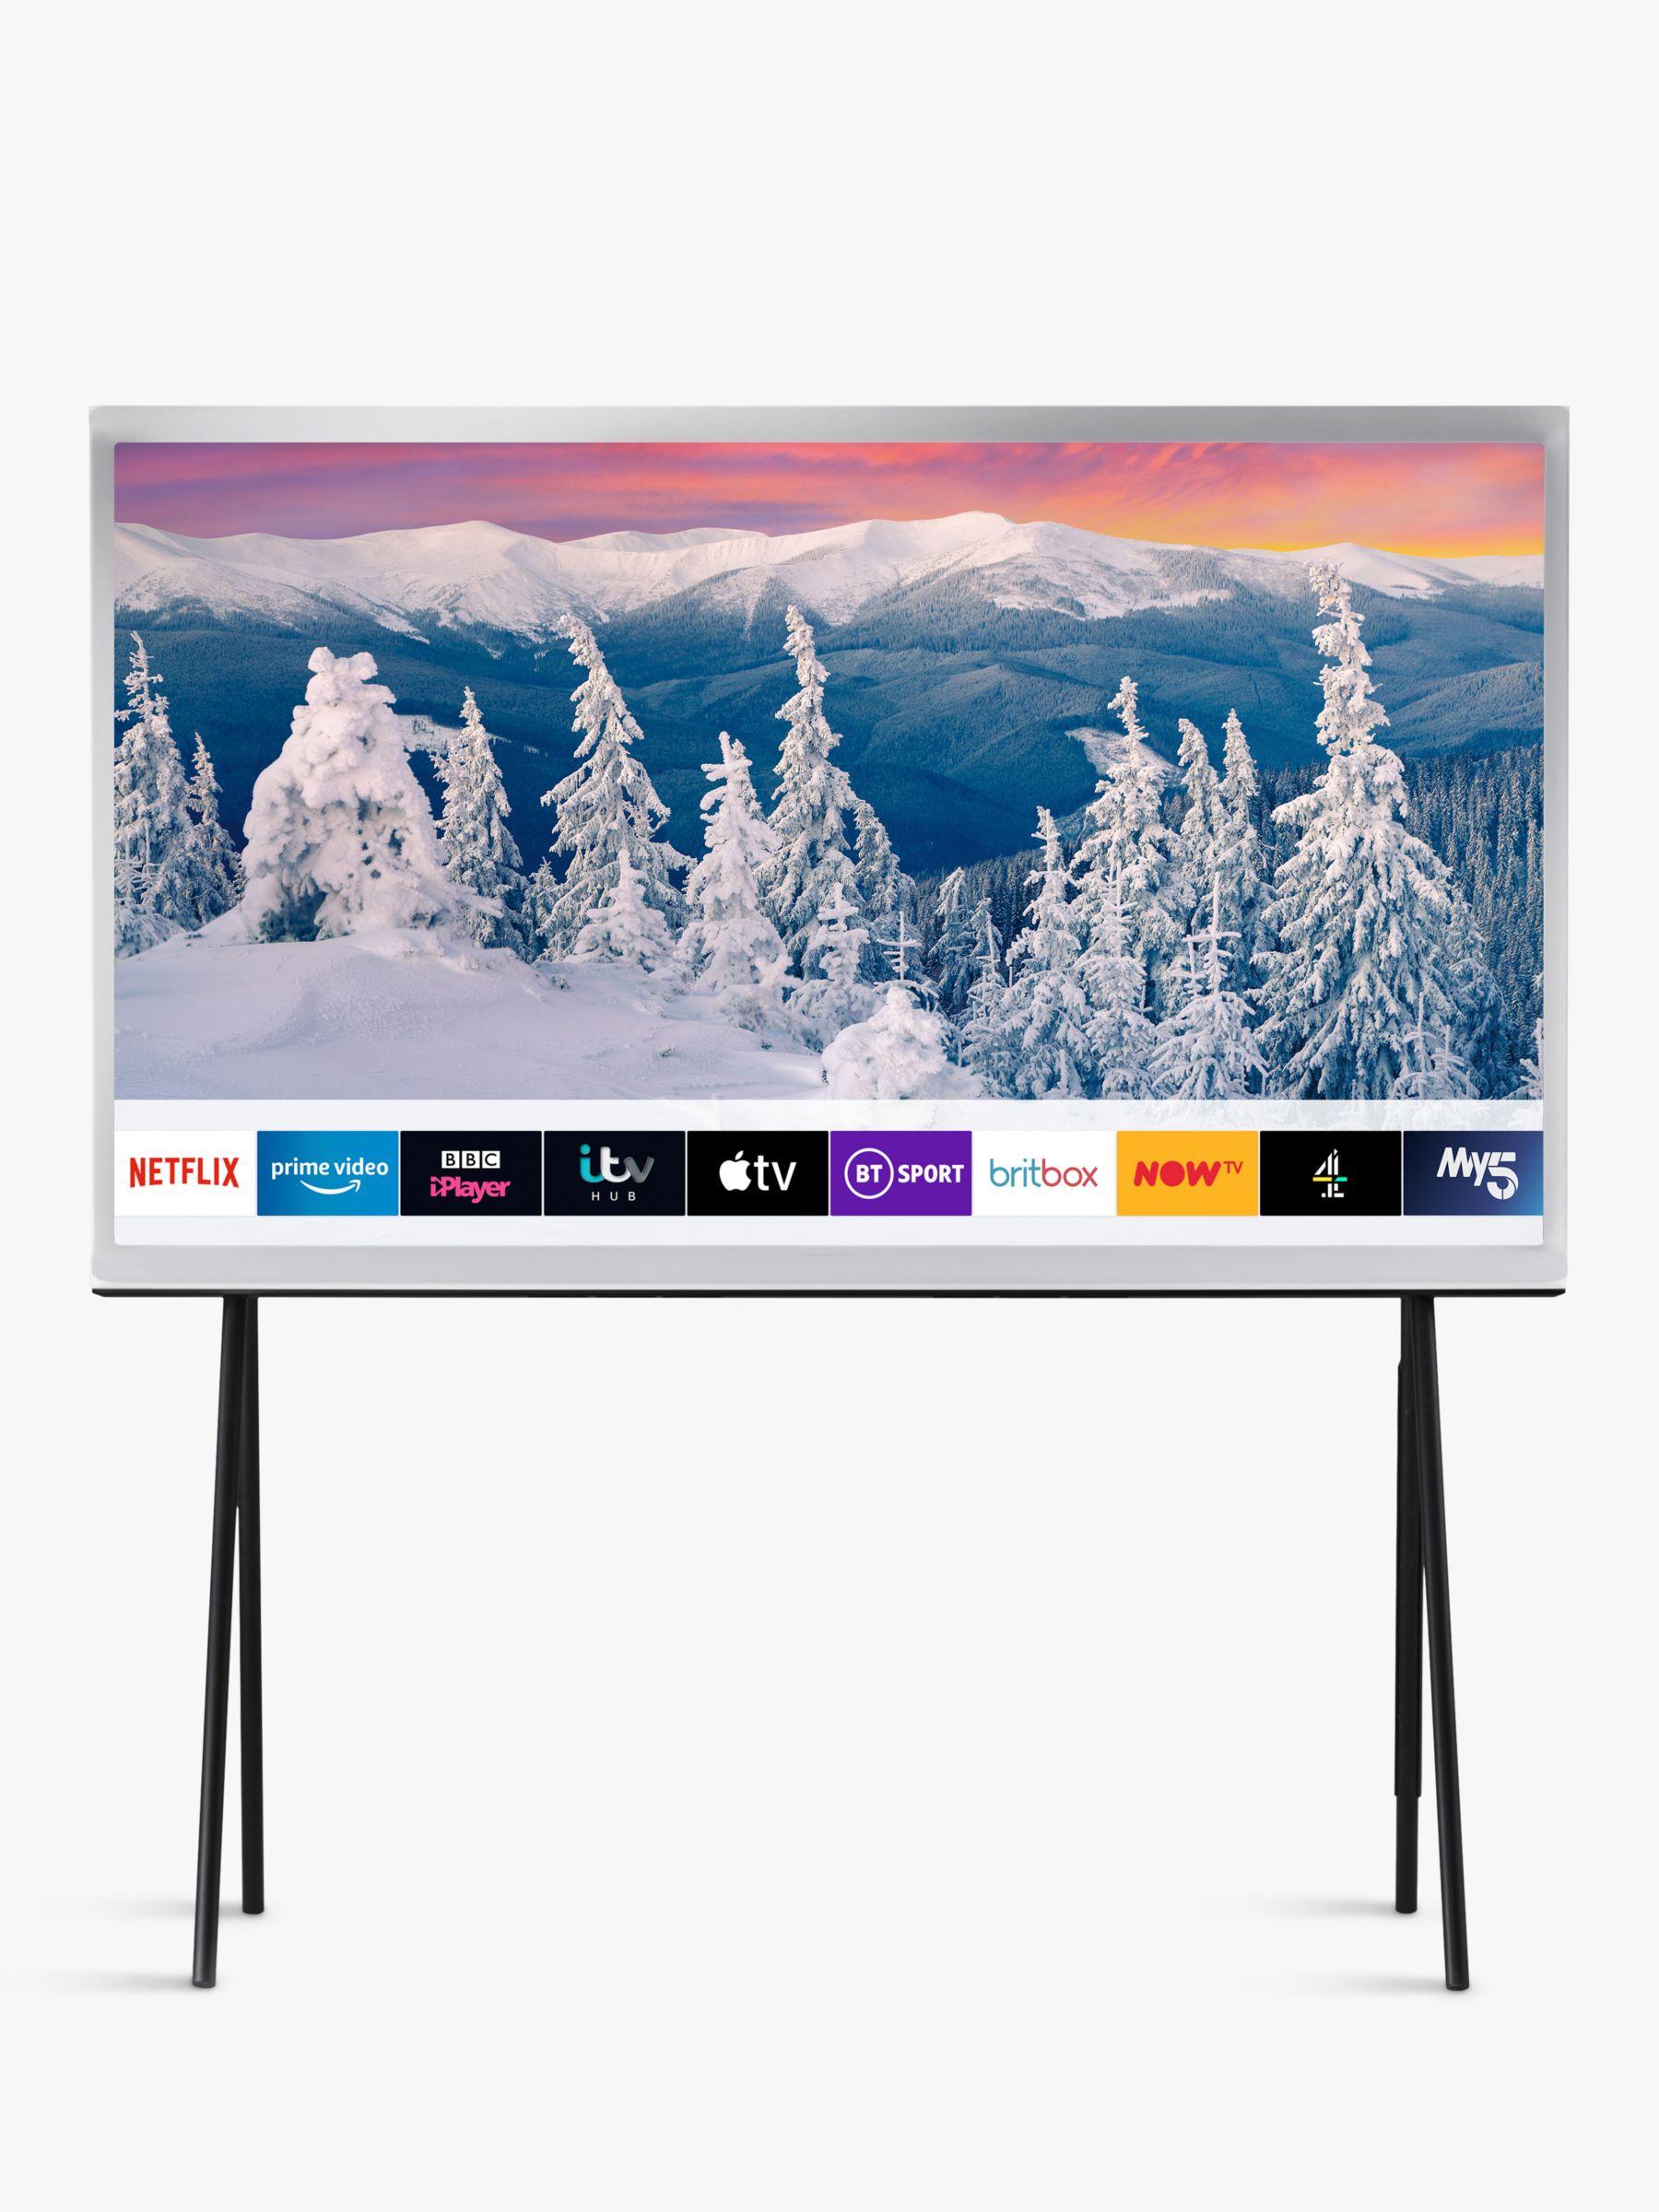 Samsung The Serif (2019) QLED HDR 4K Ultra HD Smart TV, 49